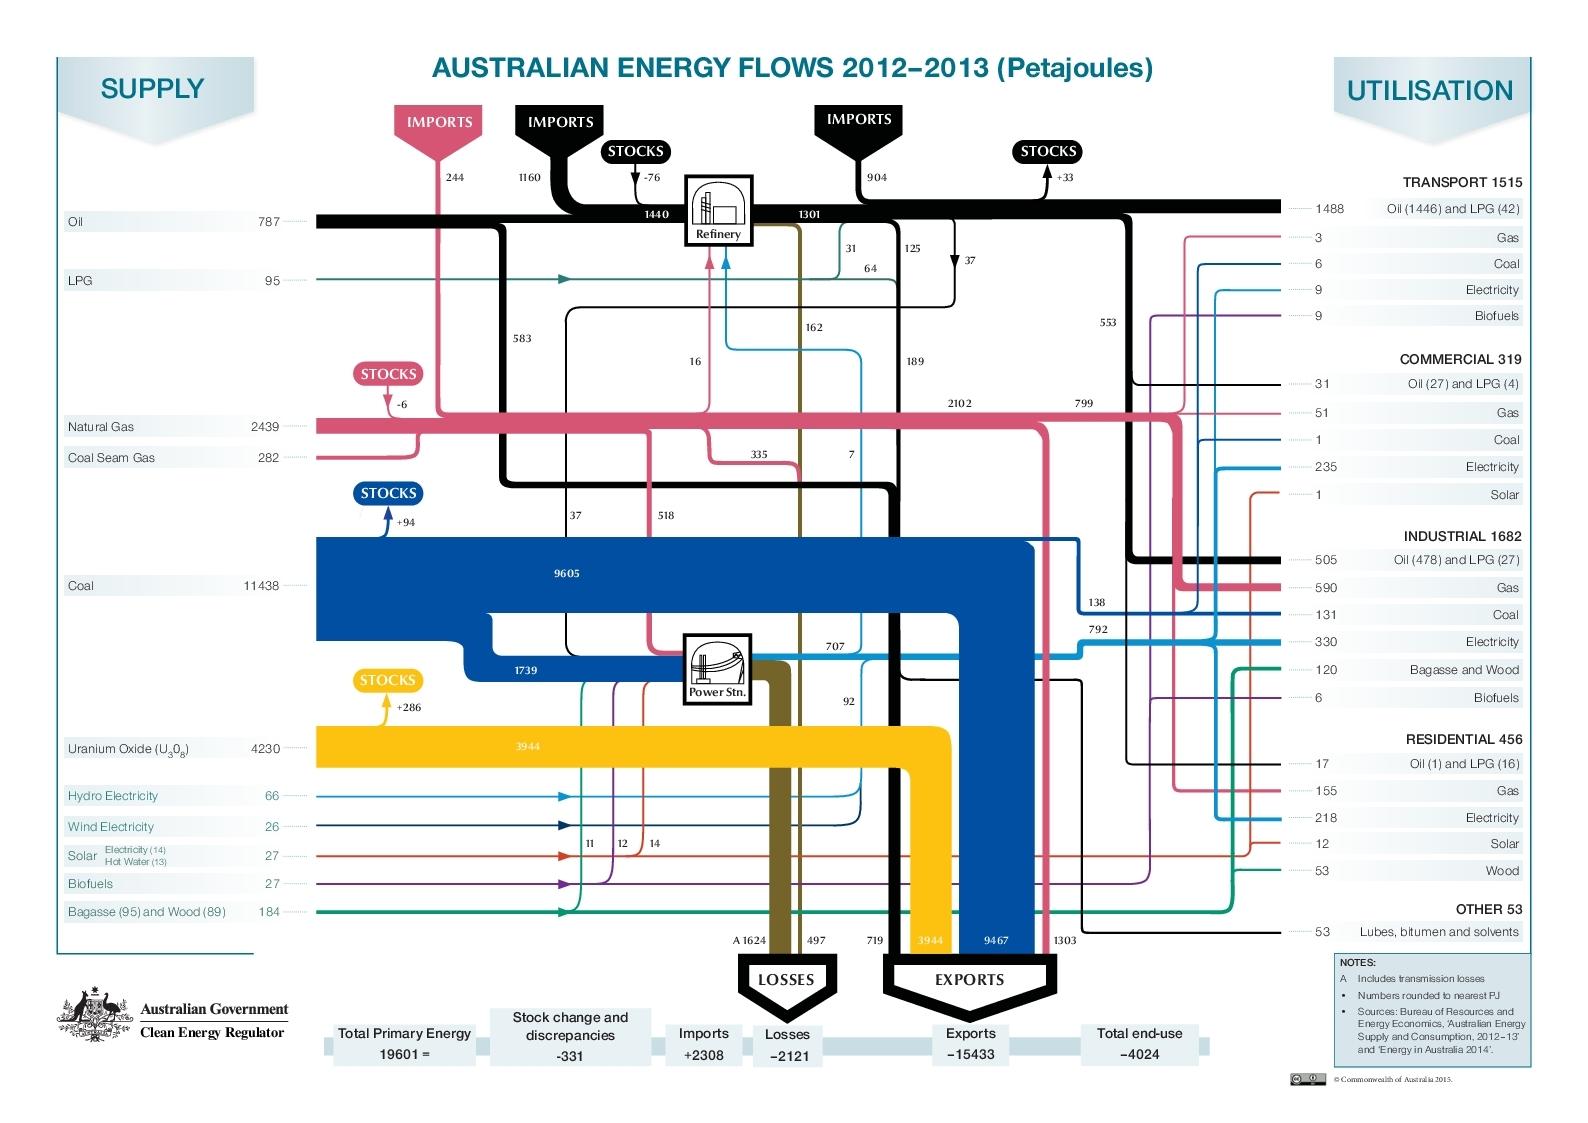 Australian Energy Flows 2012-13